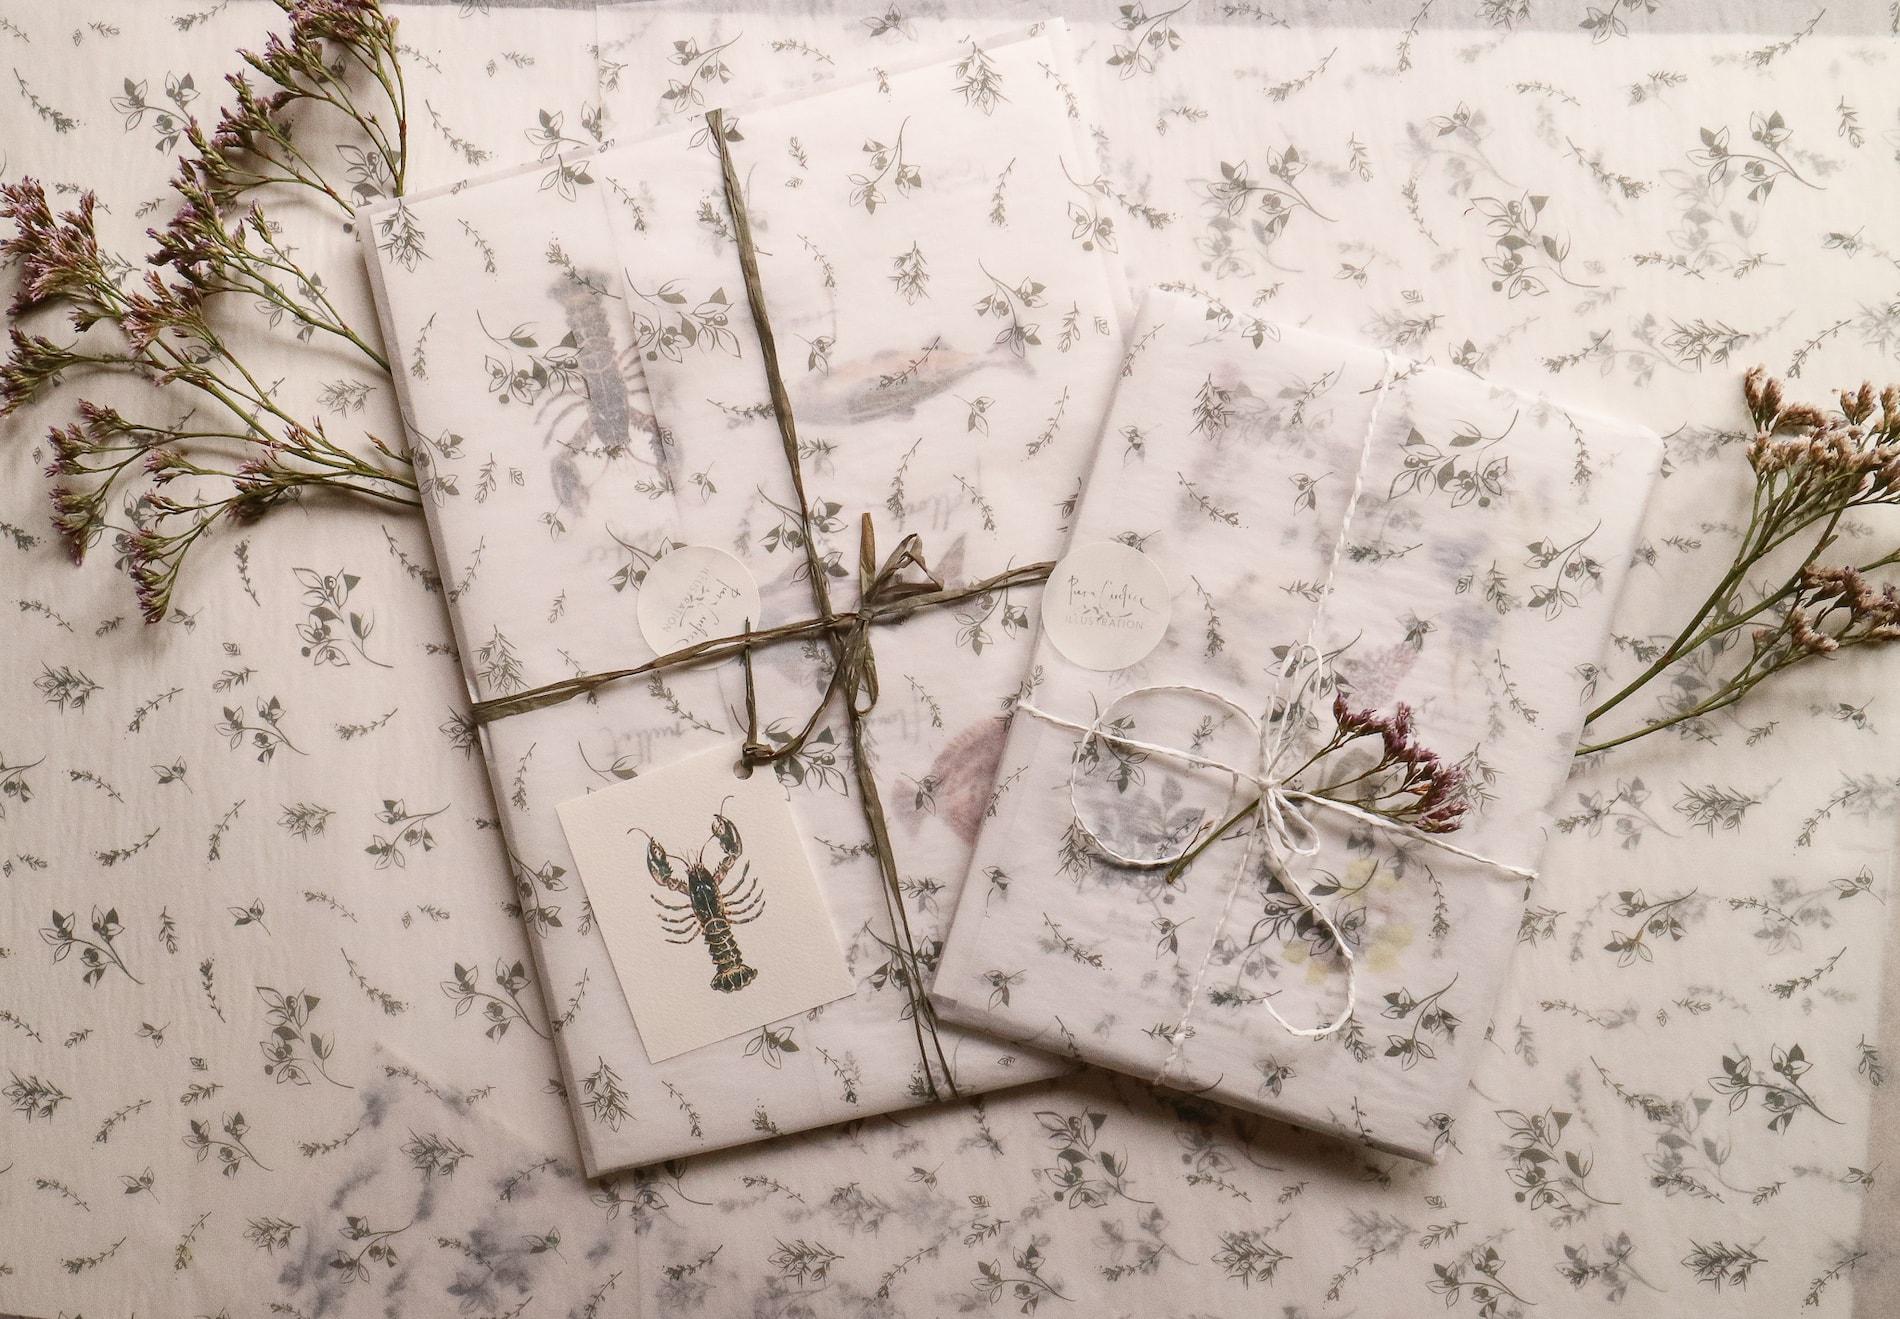 Piera Cirefice's custom tissue paper